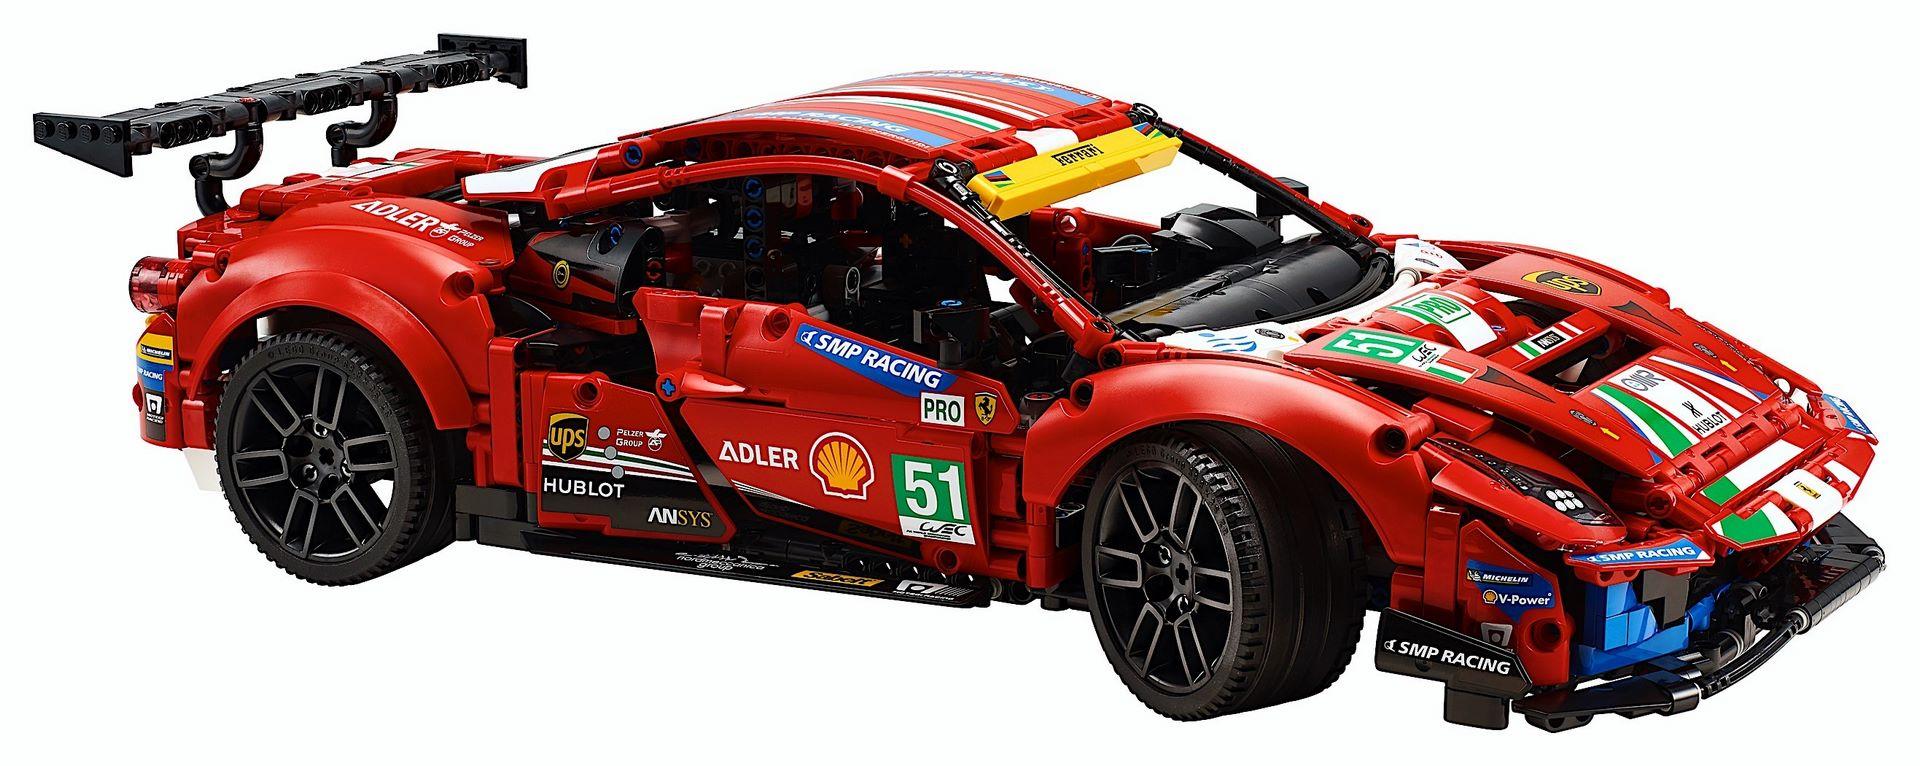 Lego-Technic-Ferrari-488-GTE-AF-Corse-51-12